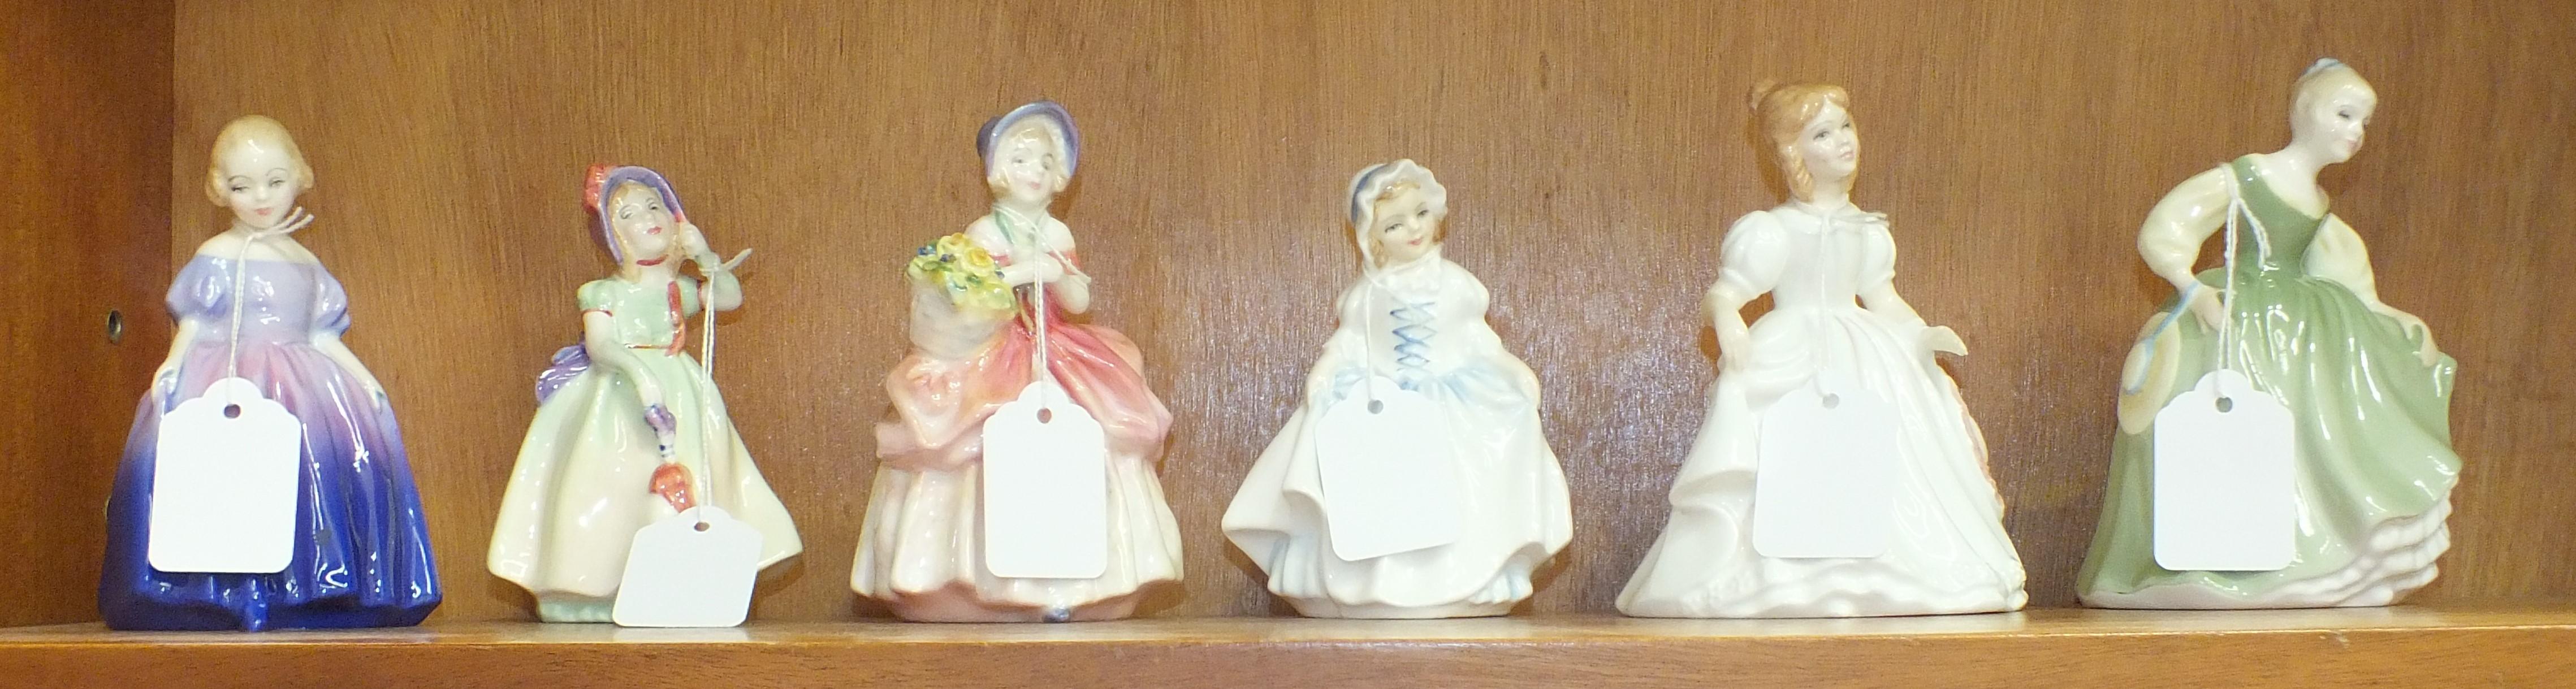 Lot 125 - Six Royal Doulton figurines: 'Babie' HN1679, 'Marie' HN1370, 'Dinky Do' HN3618, 'Cissie' HN1809, '